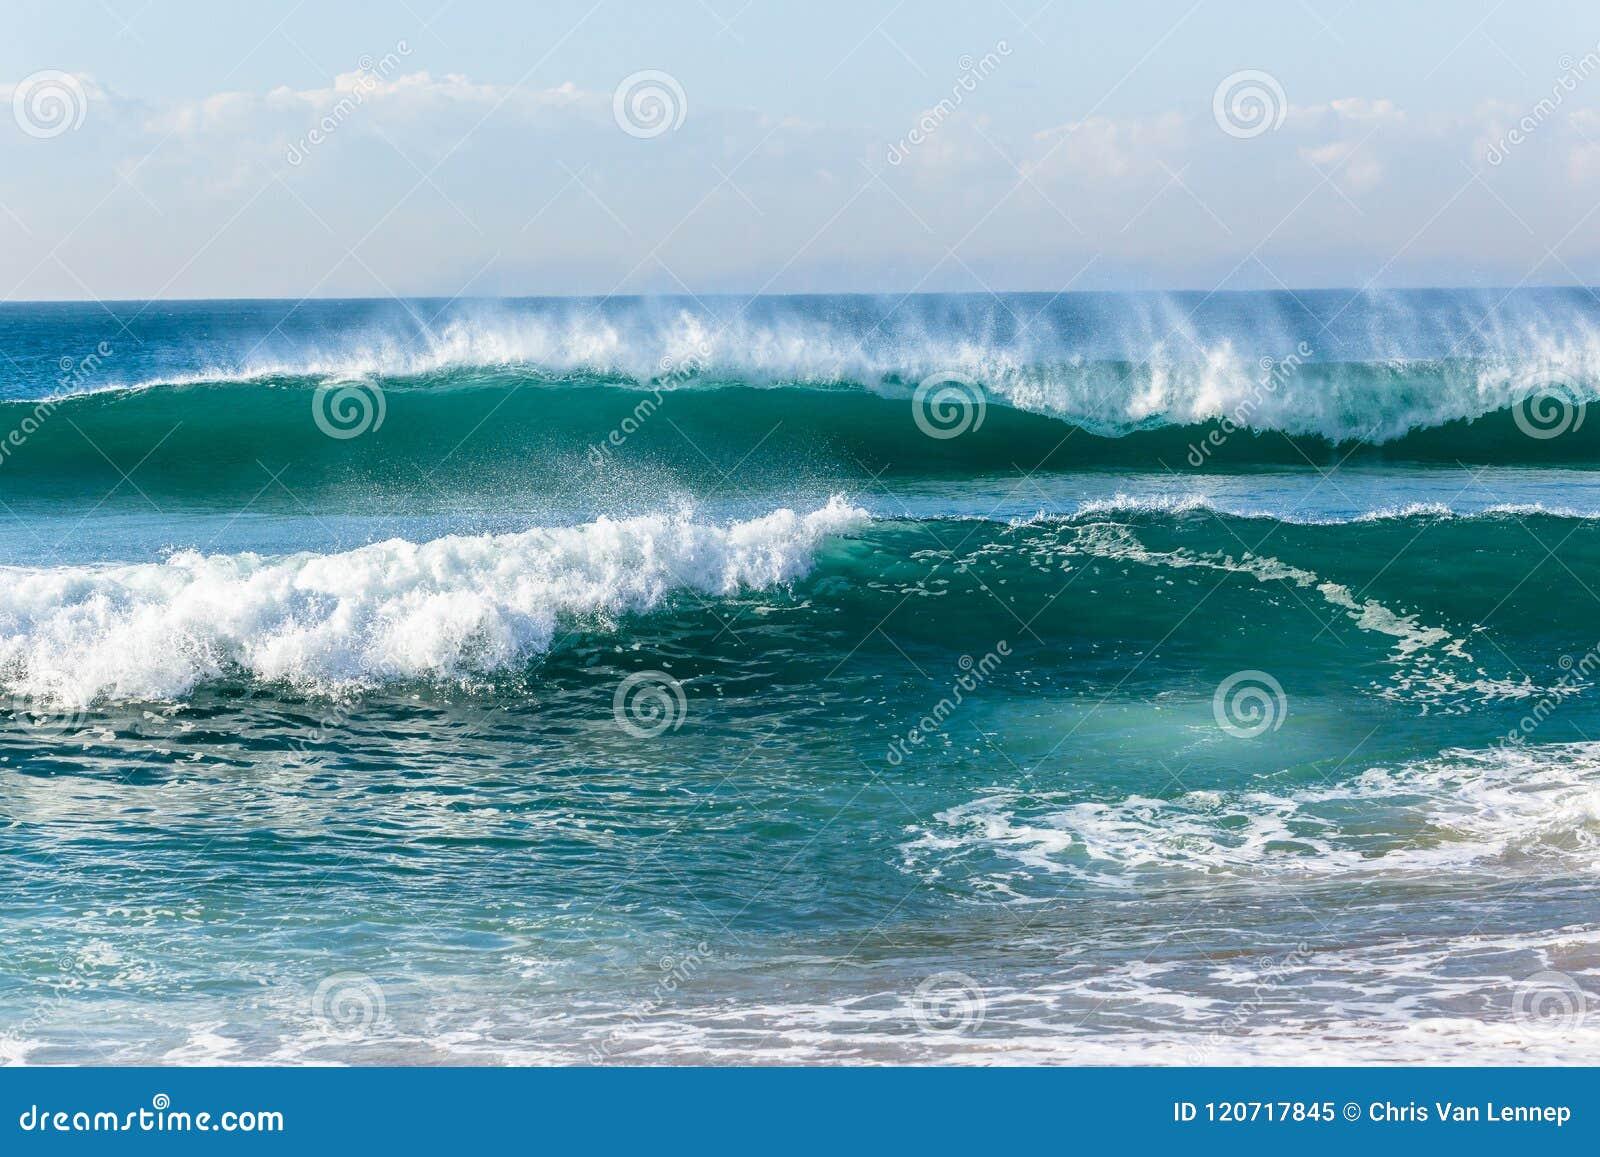 Beach Ocean Waves Shoreline